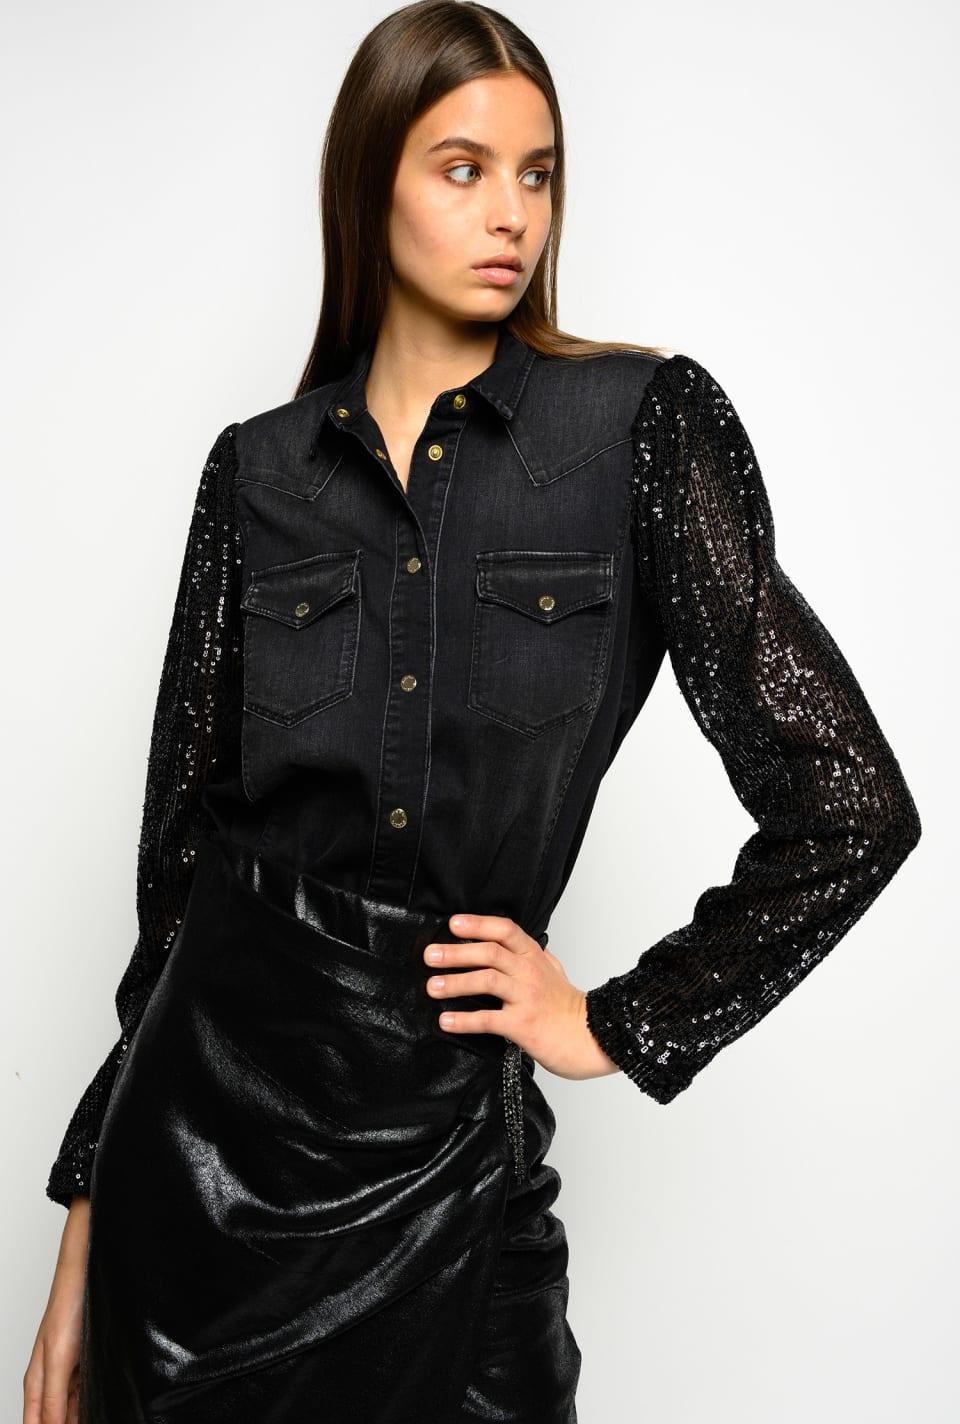 Camisa de denim con mangas de lentejuelas - Pinko